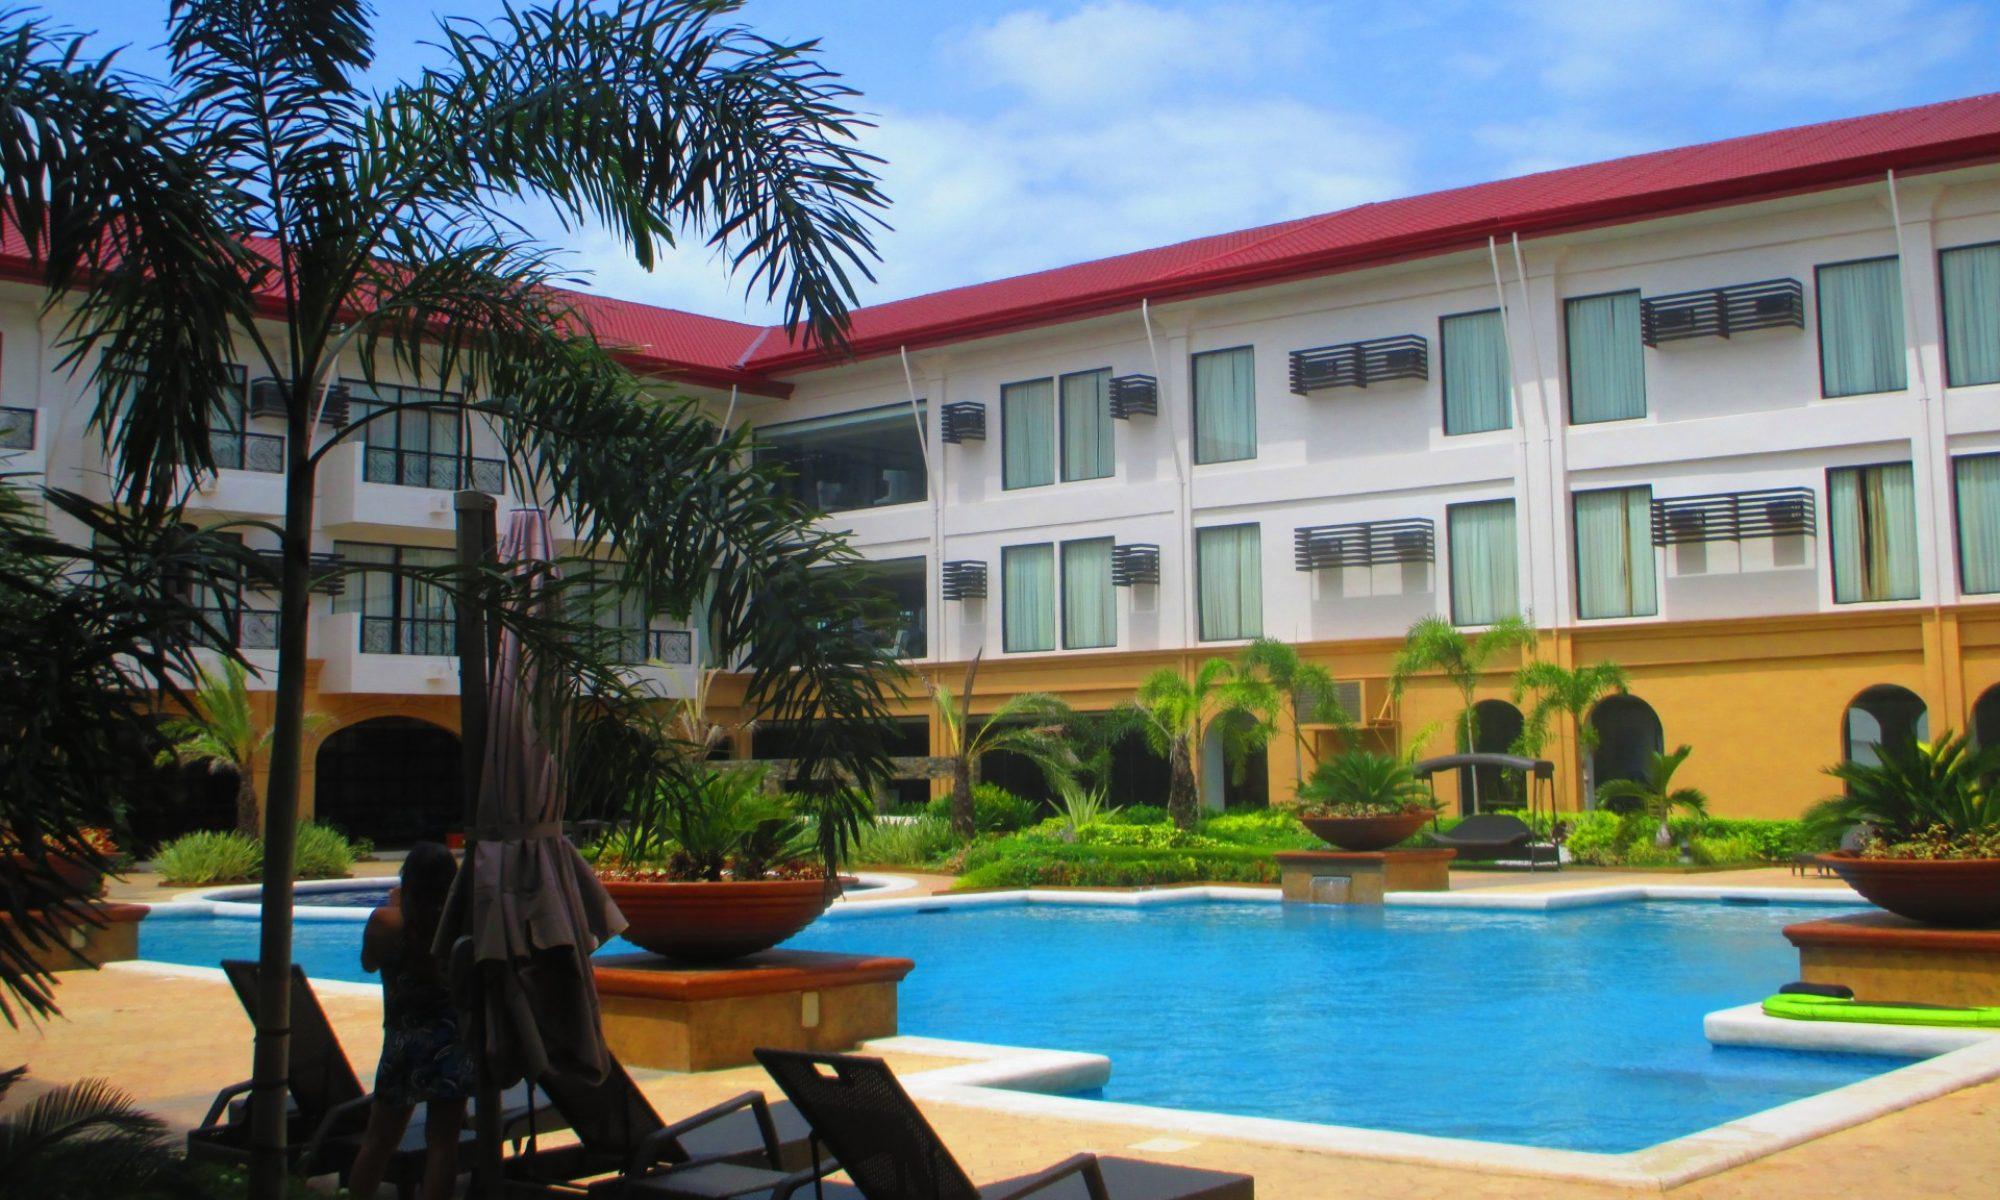 Hotel Oázis Butuan City